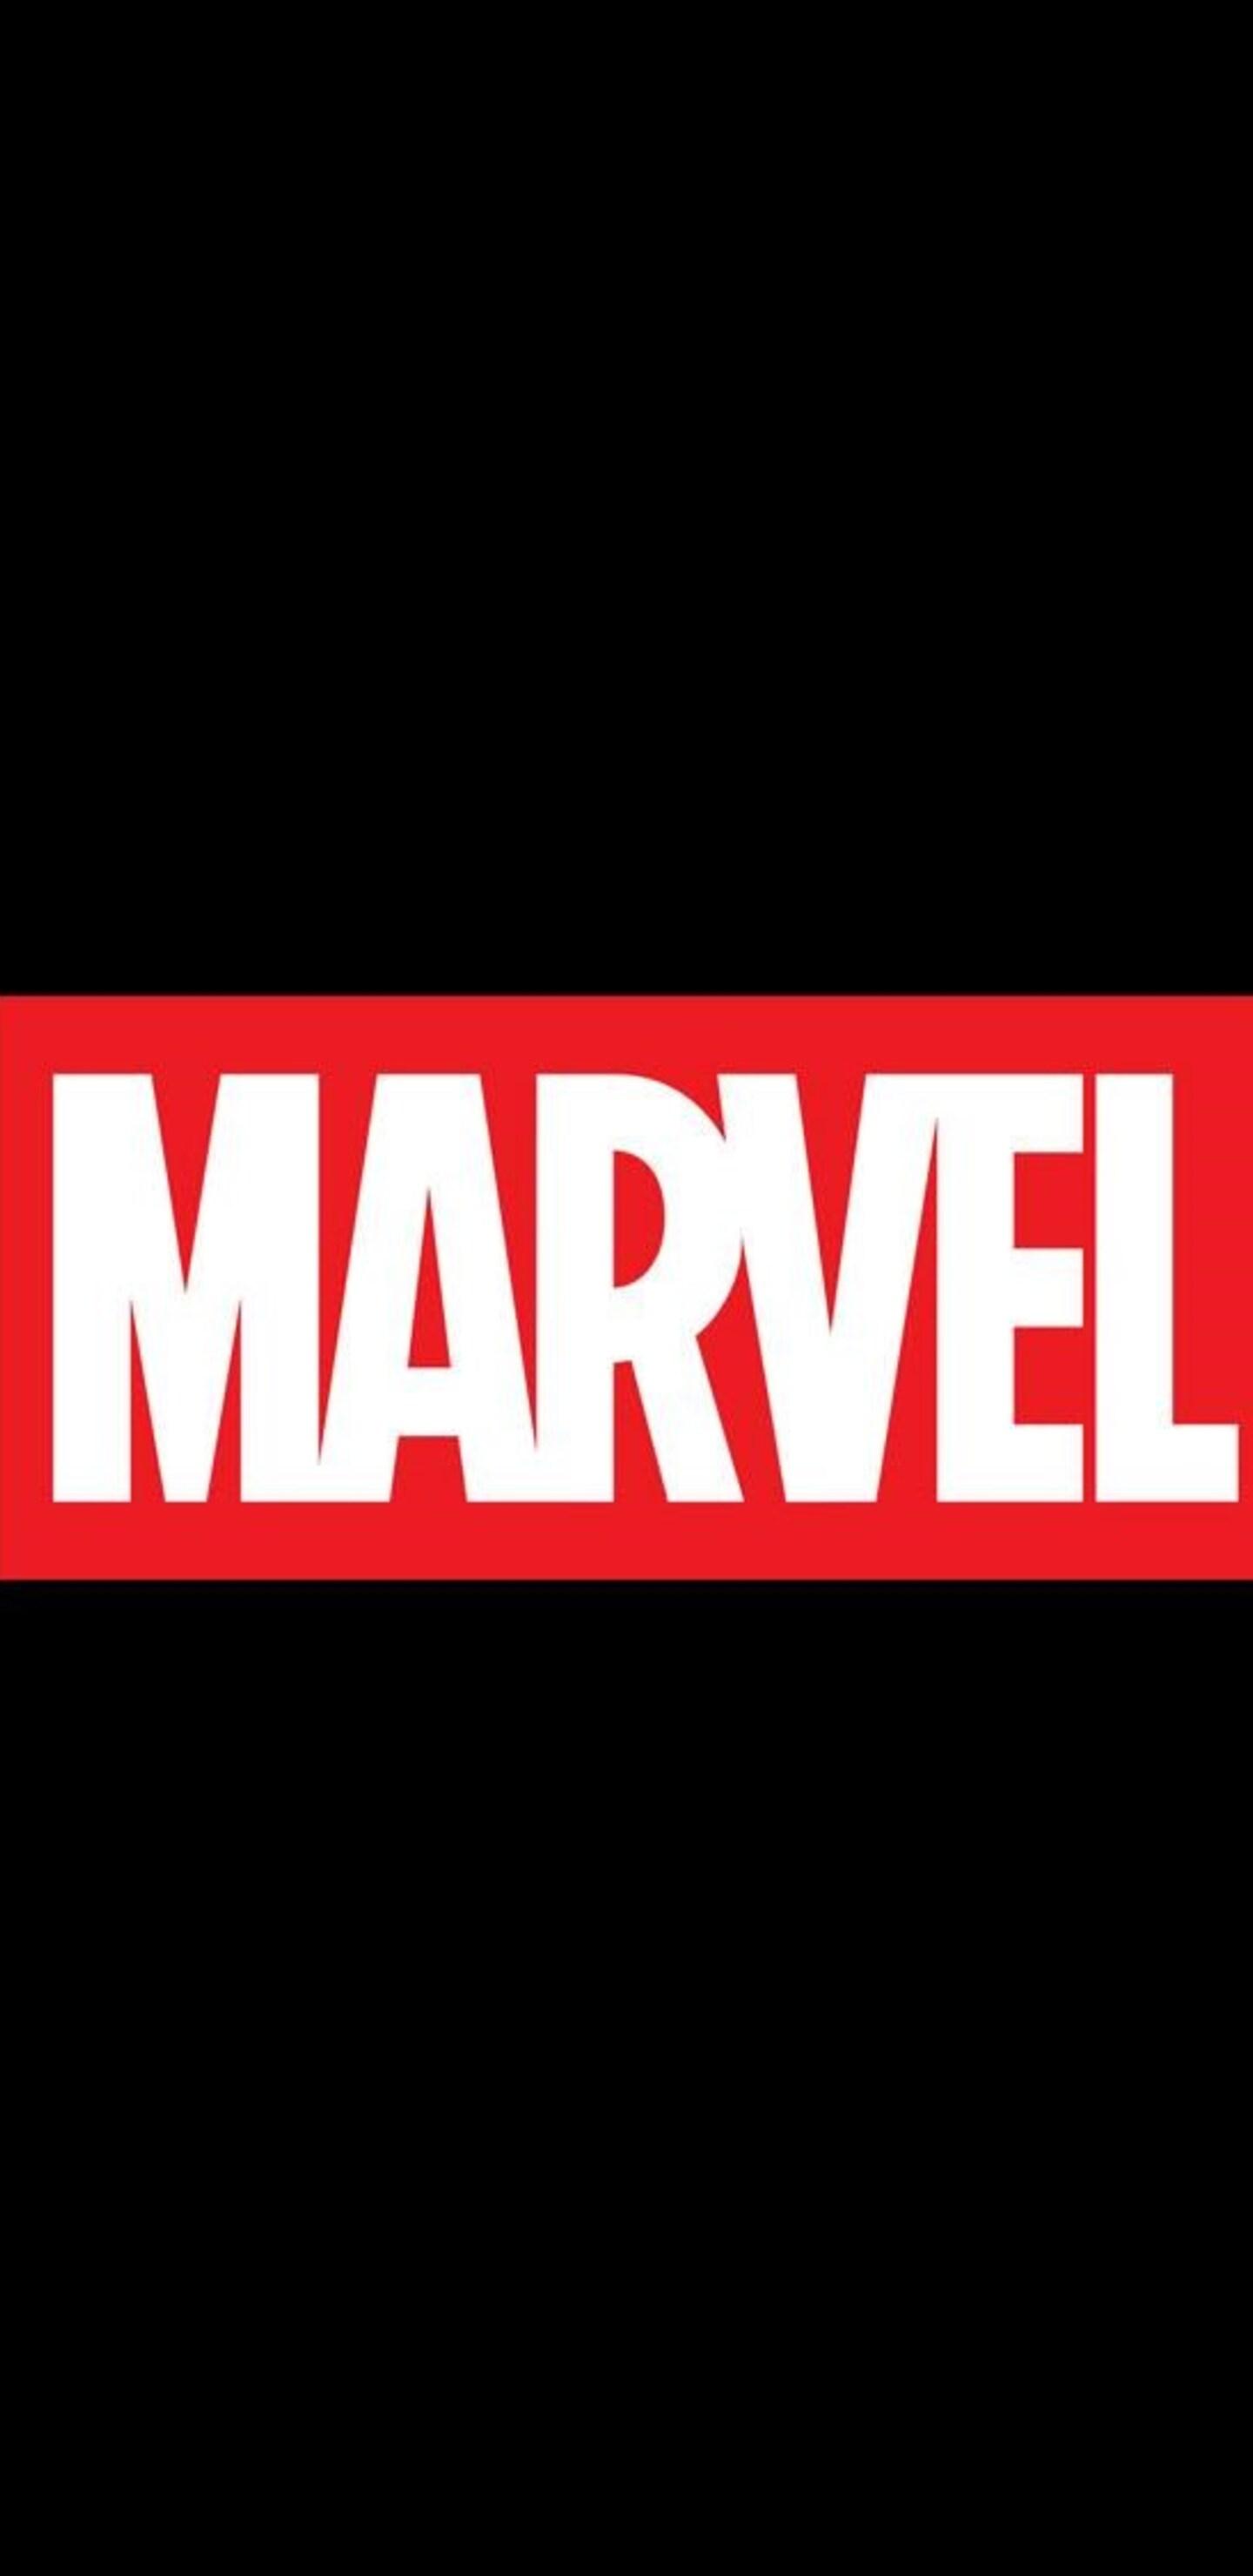 1440x2960 Marvel Studios New Logo Samsung Galaxy Note 9,8